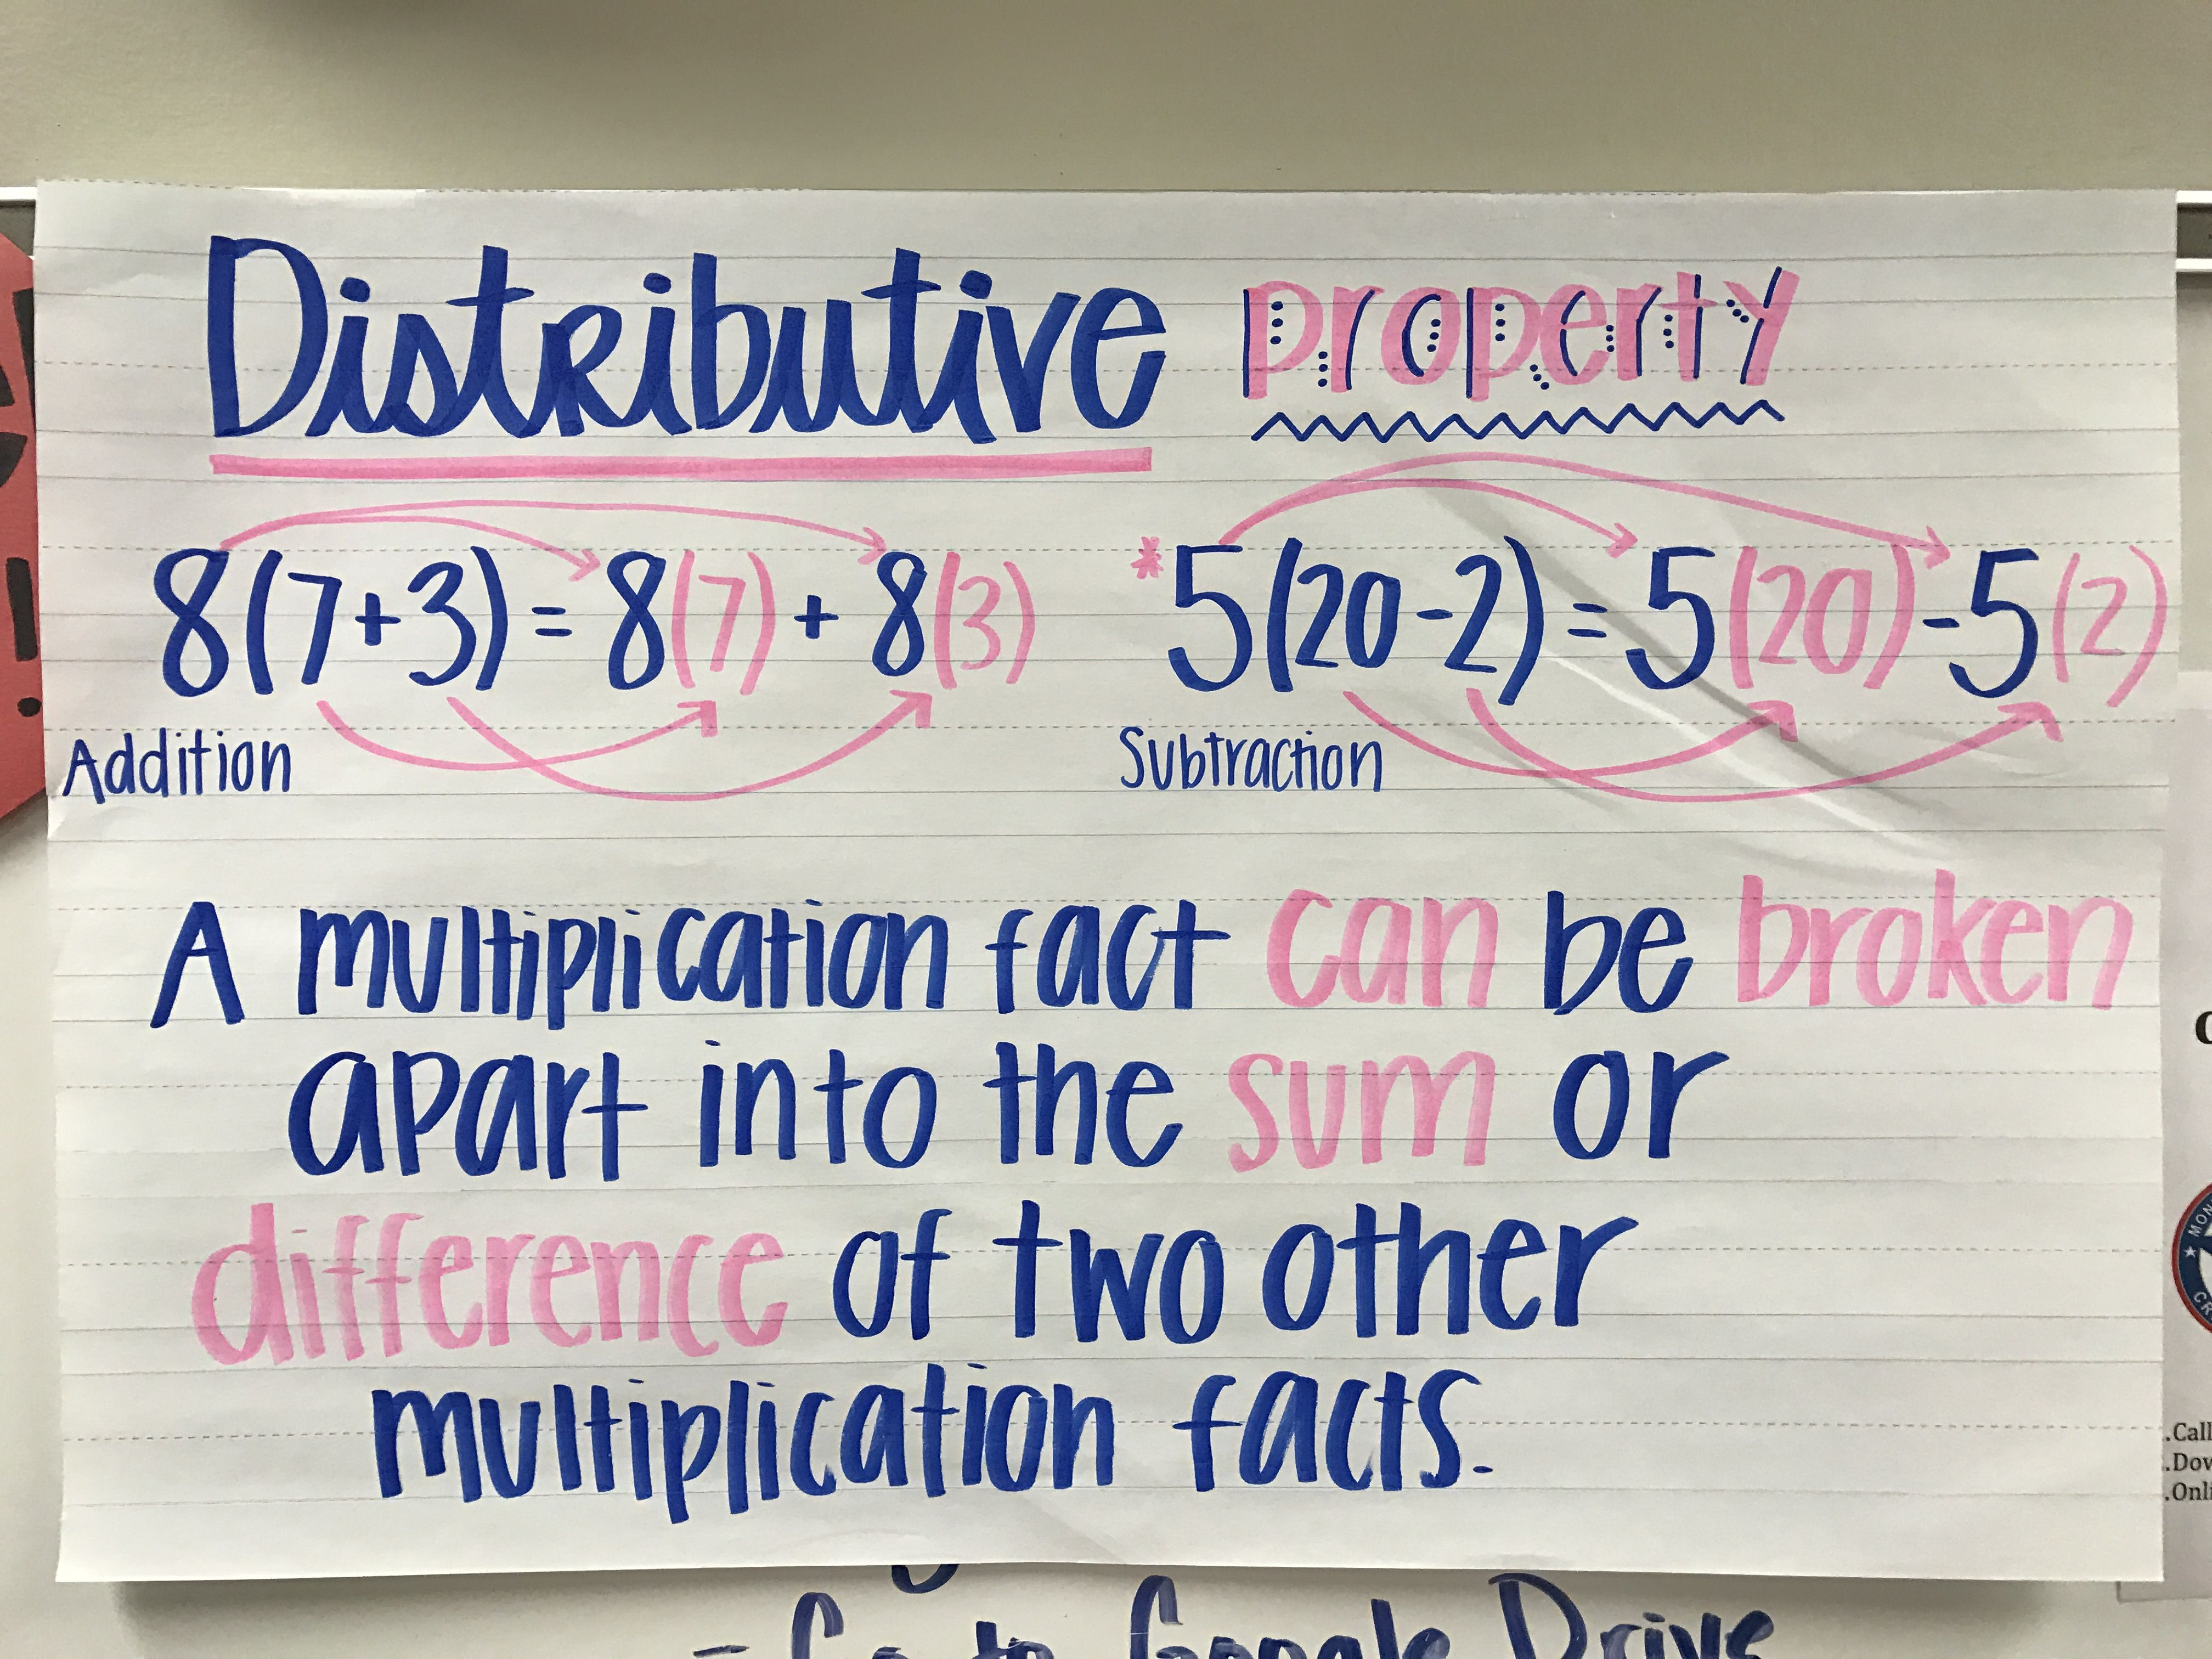 medium resolution of Distributive property